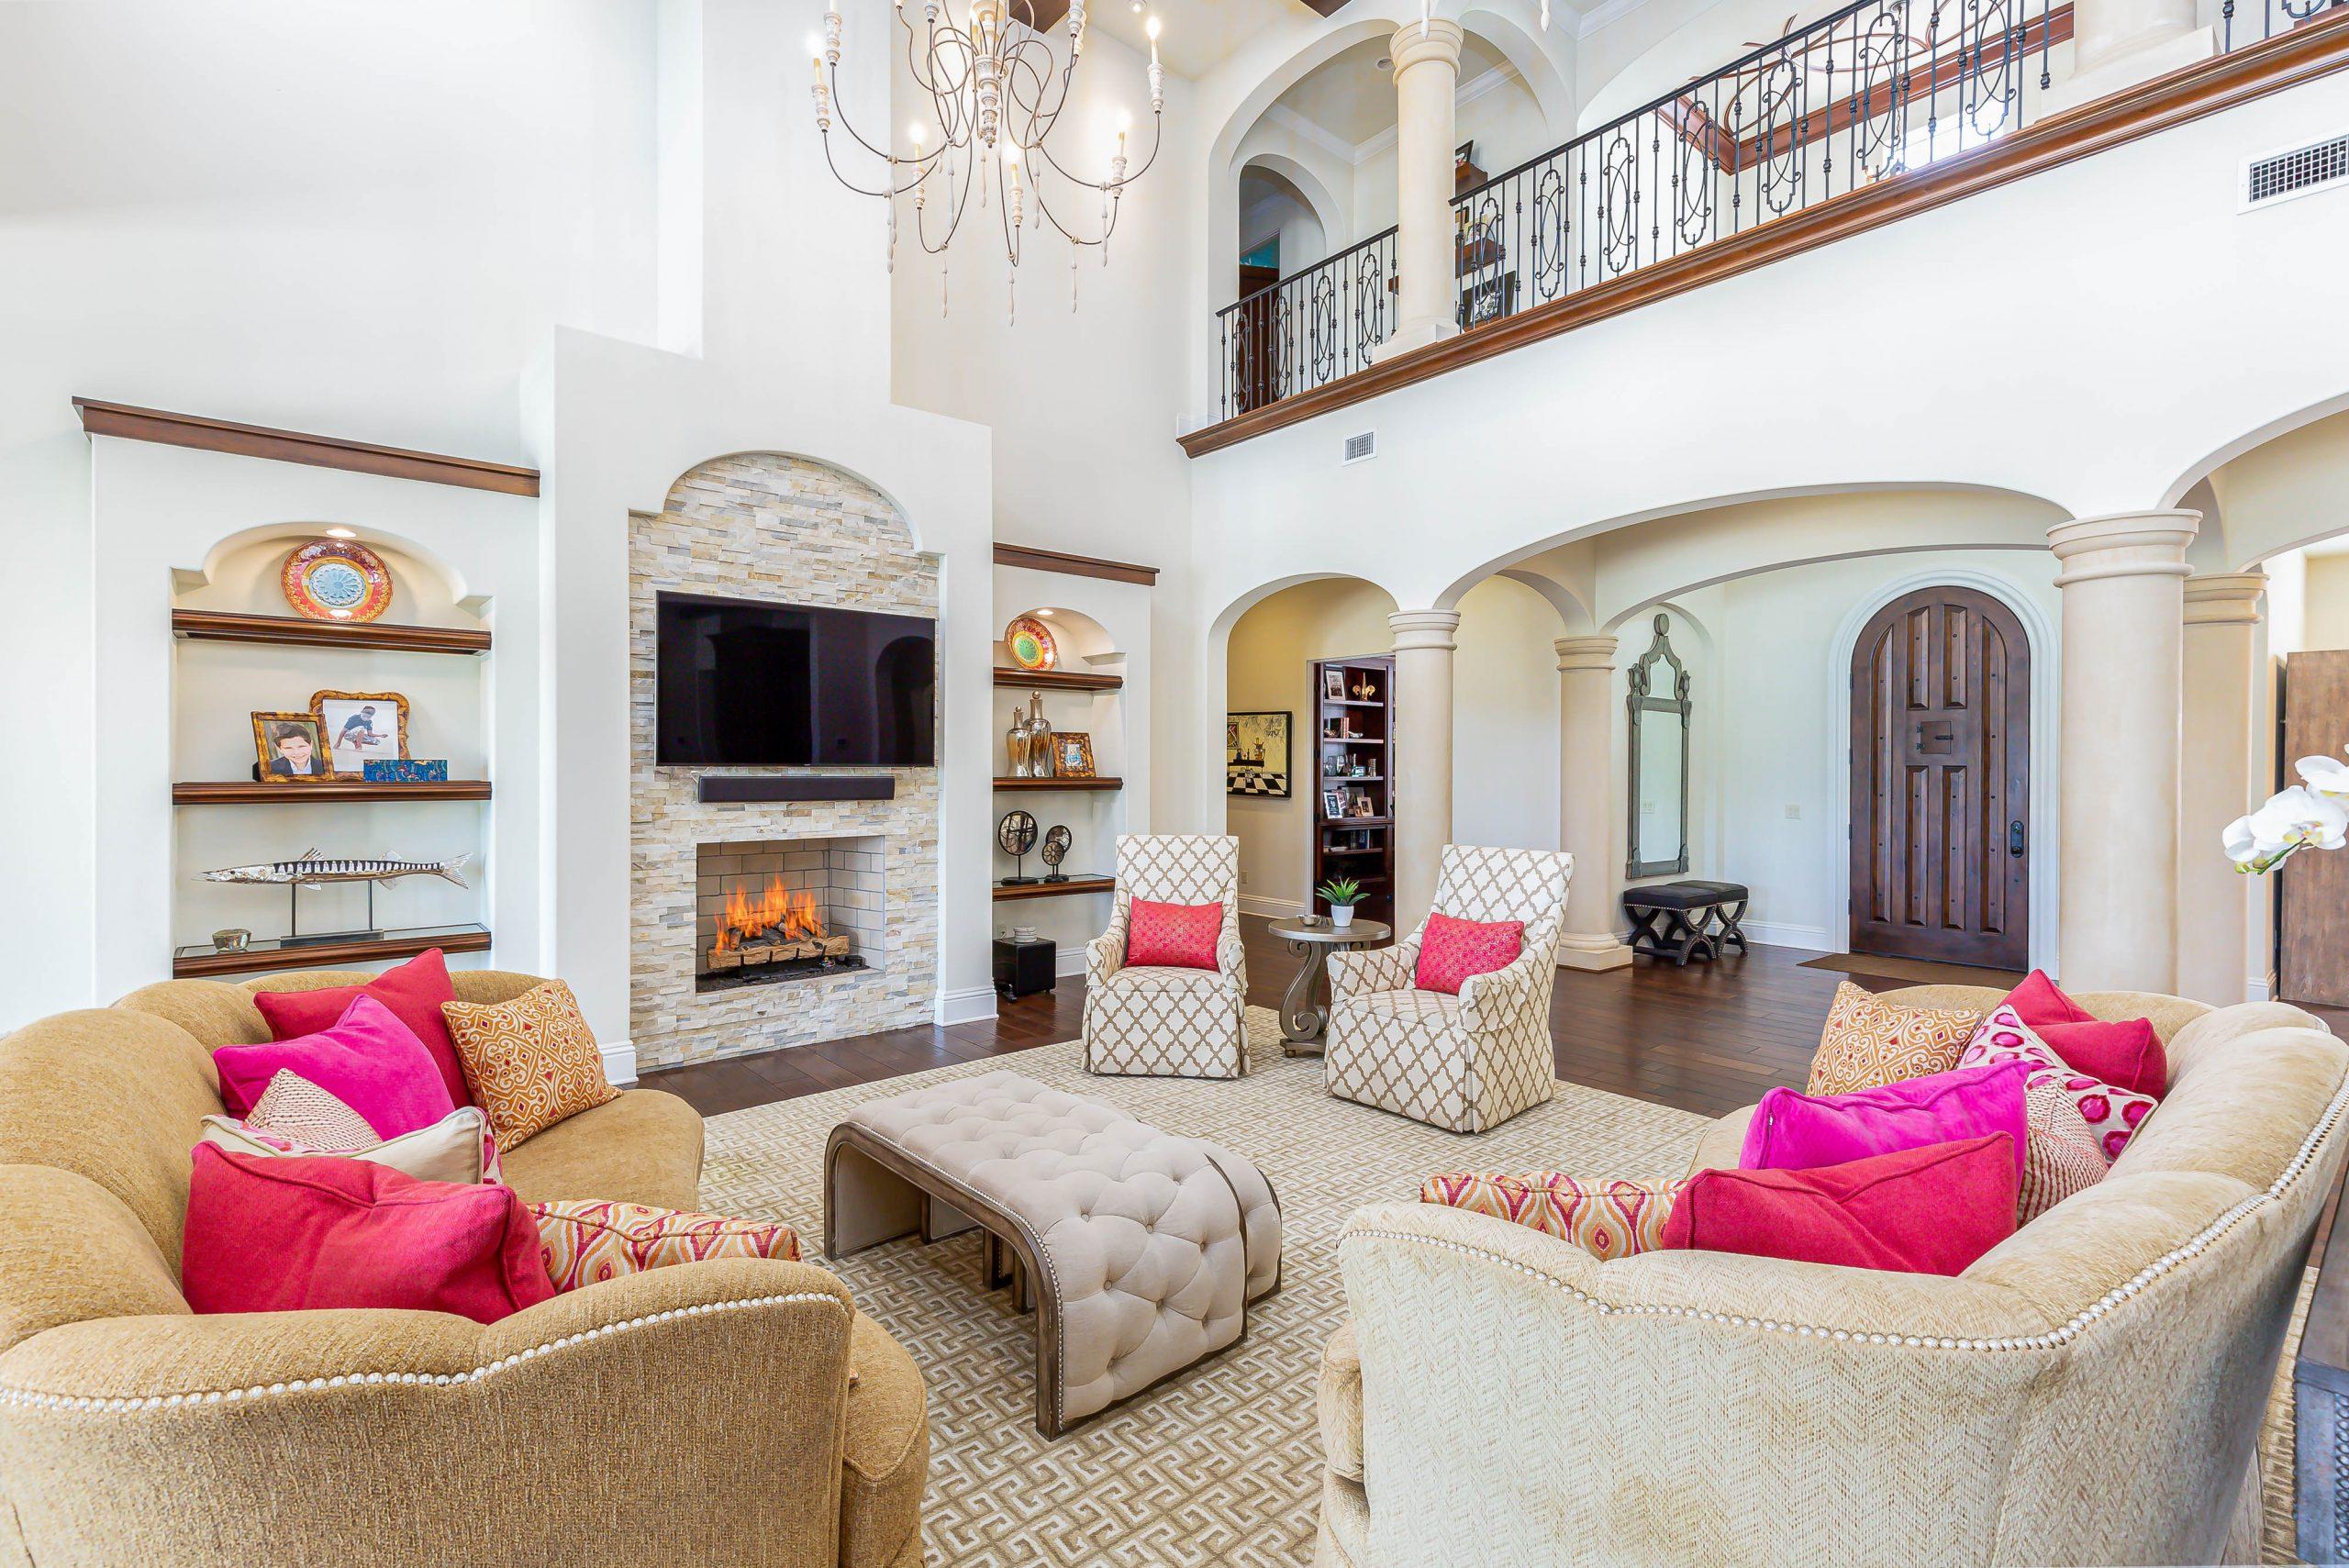 custom living room design in remodeled home by Einheit custom home builders